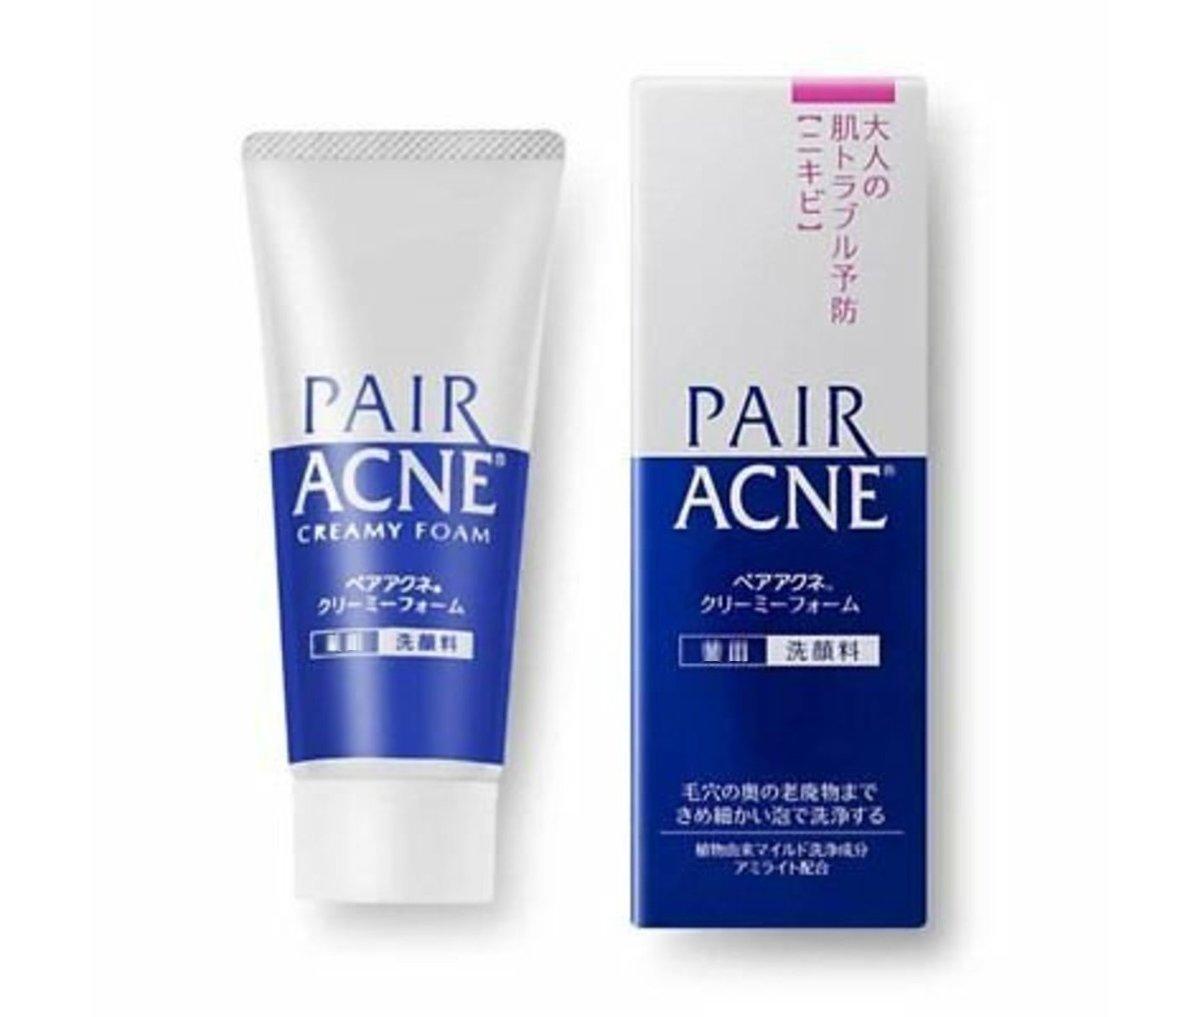 Pair Acne Creamy Foam Facial Washing Foam 80g (Parallel lmport)